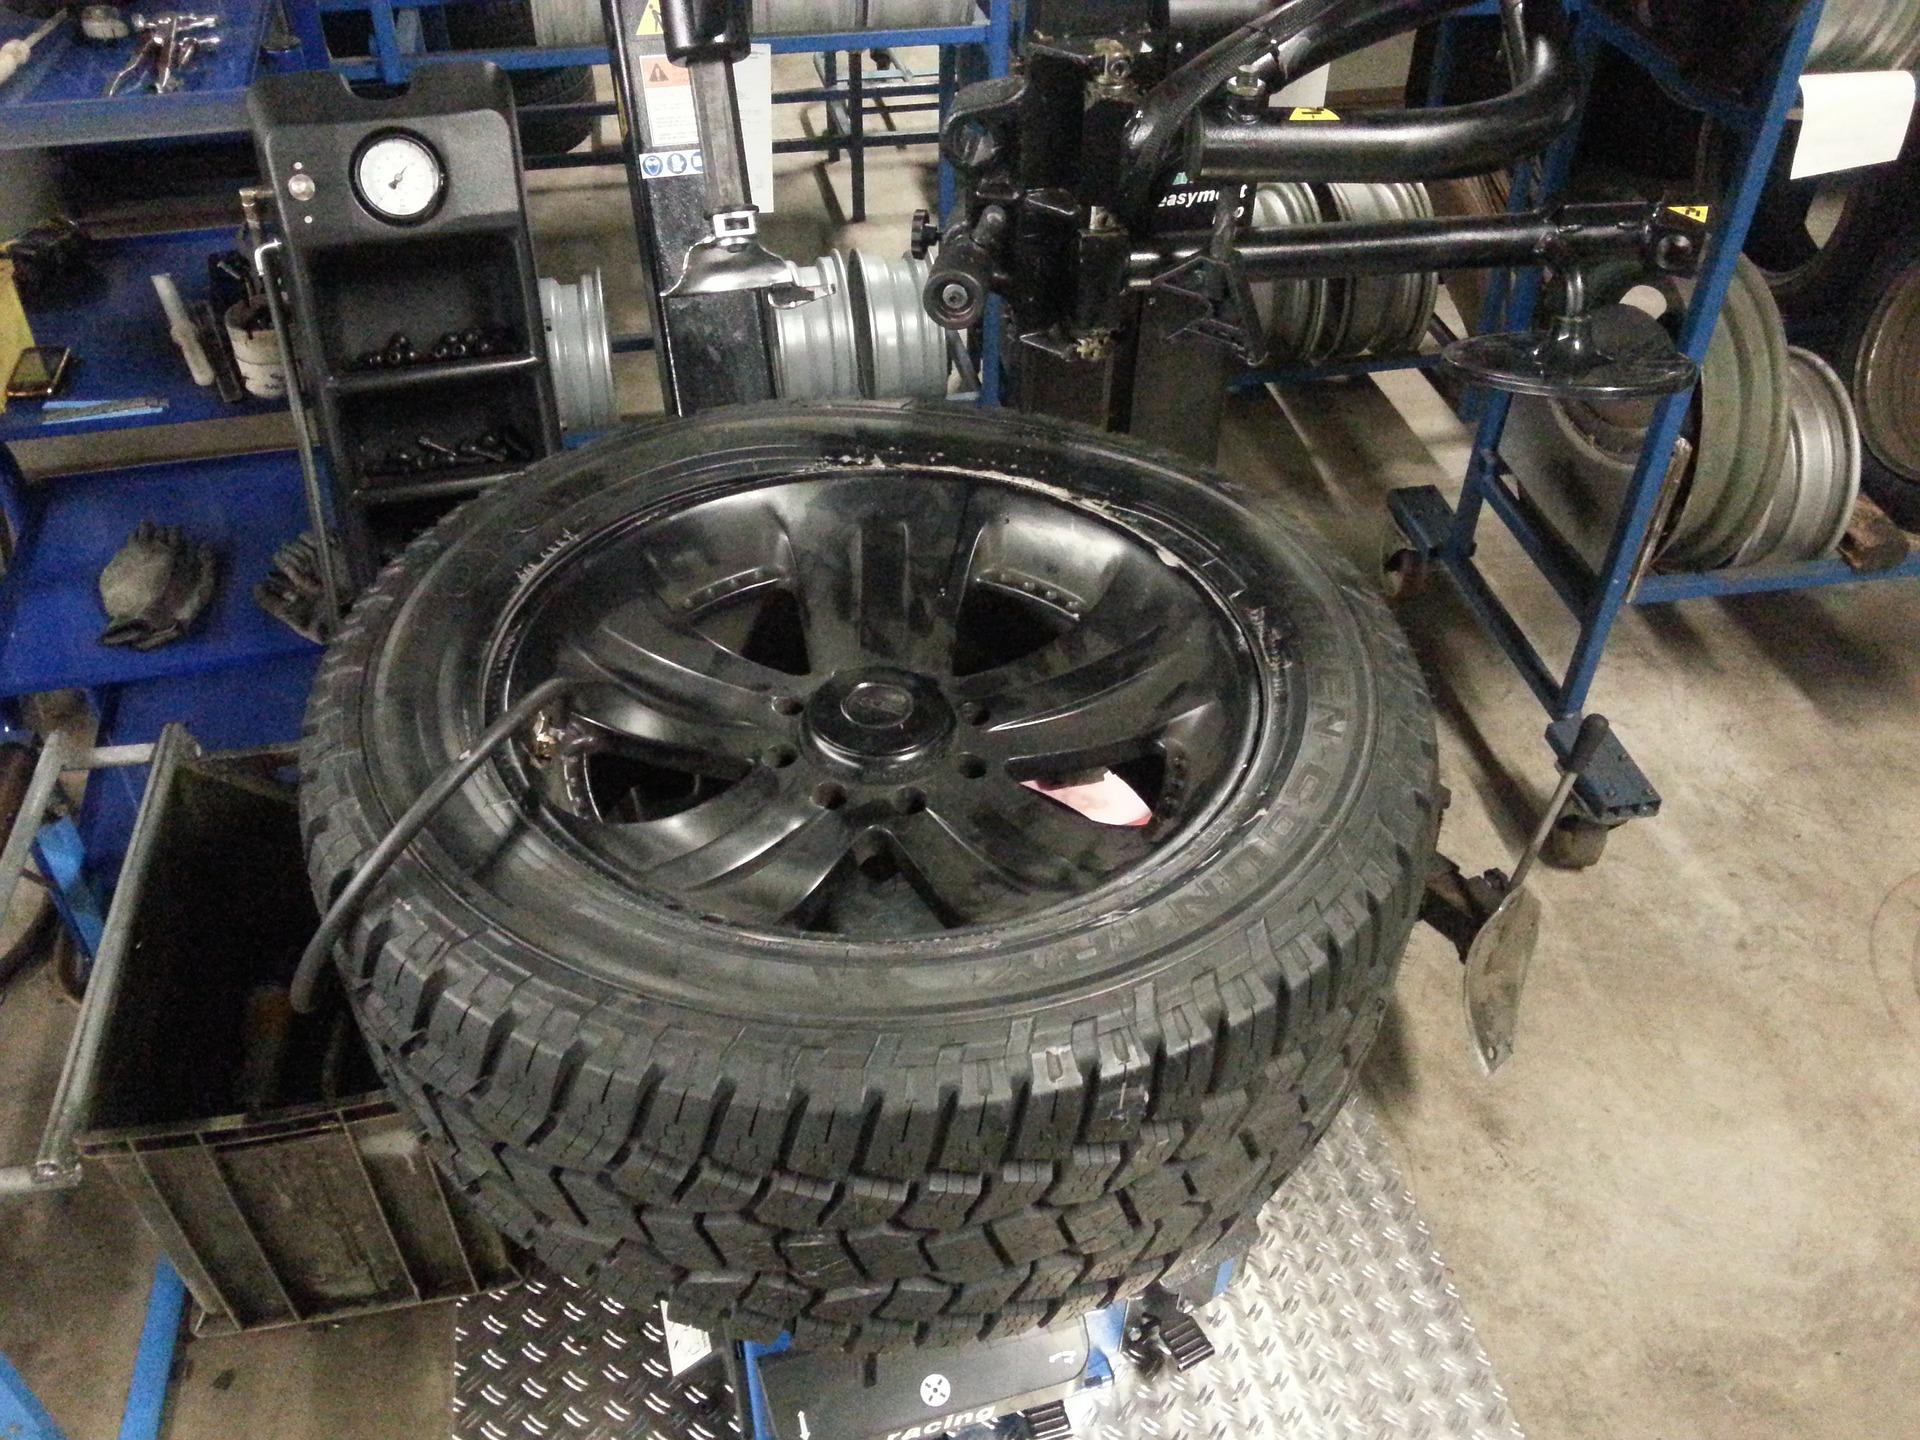 winter-tires-206991_1920-1